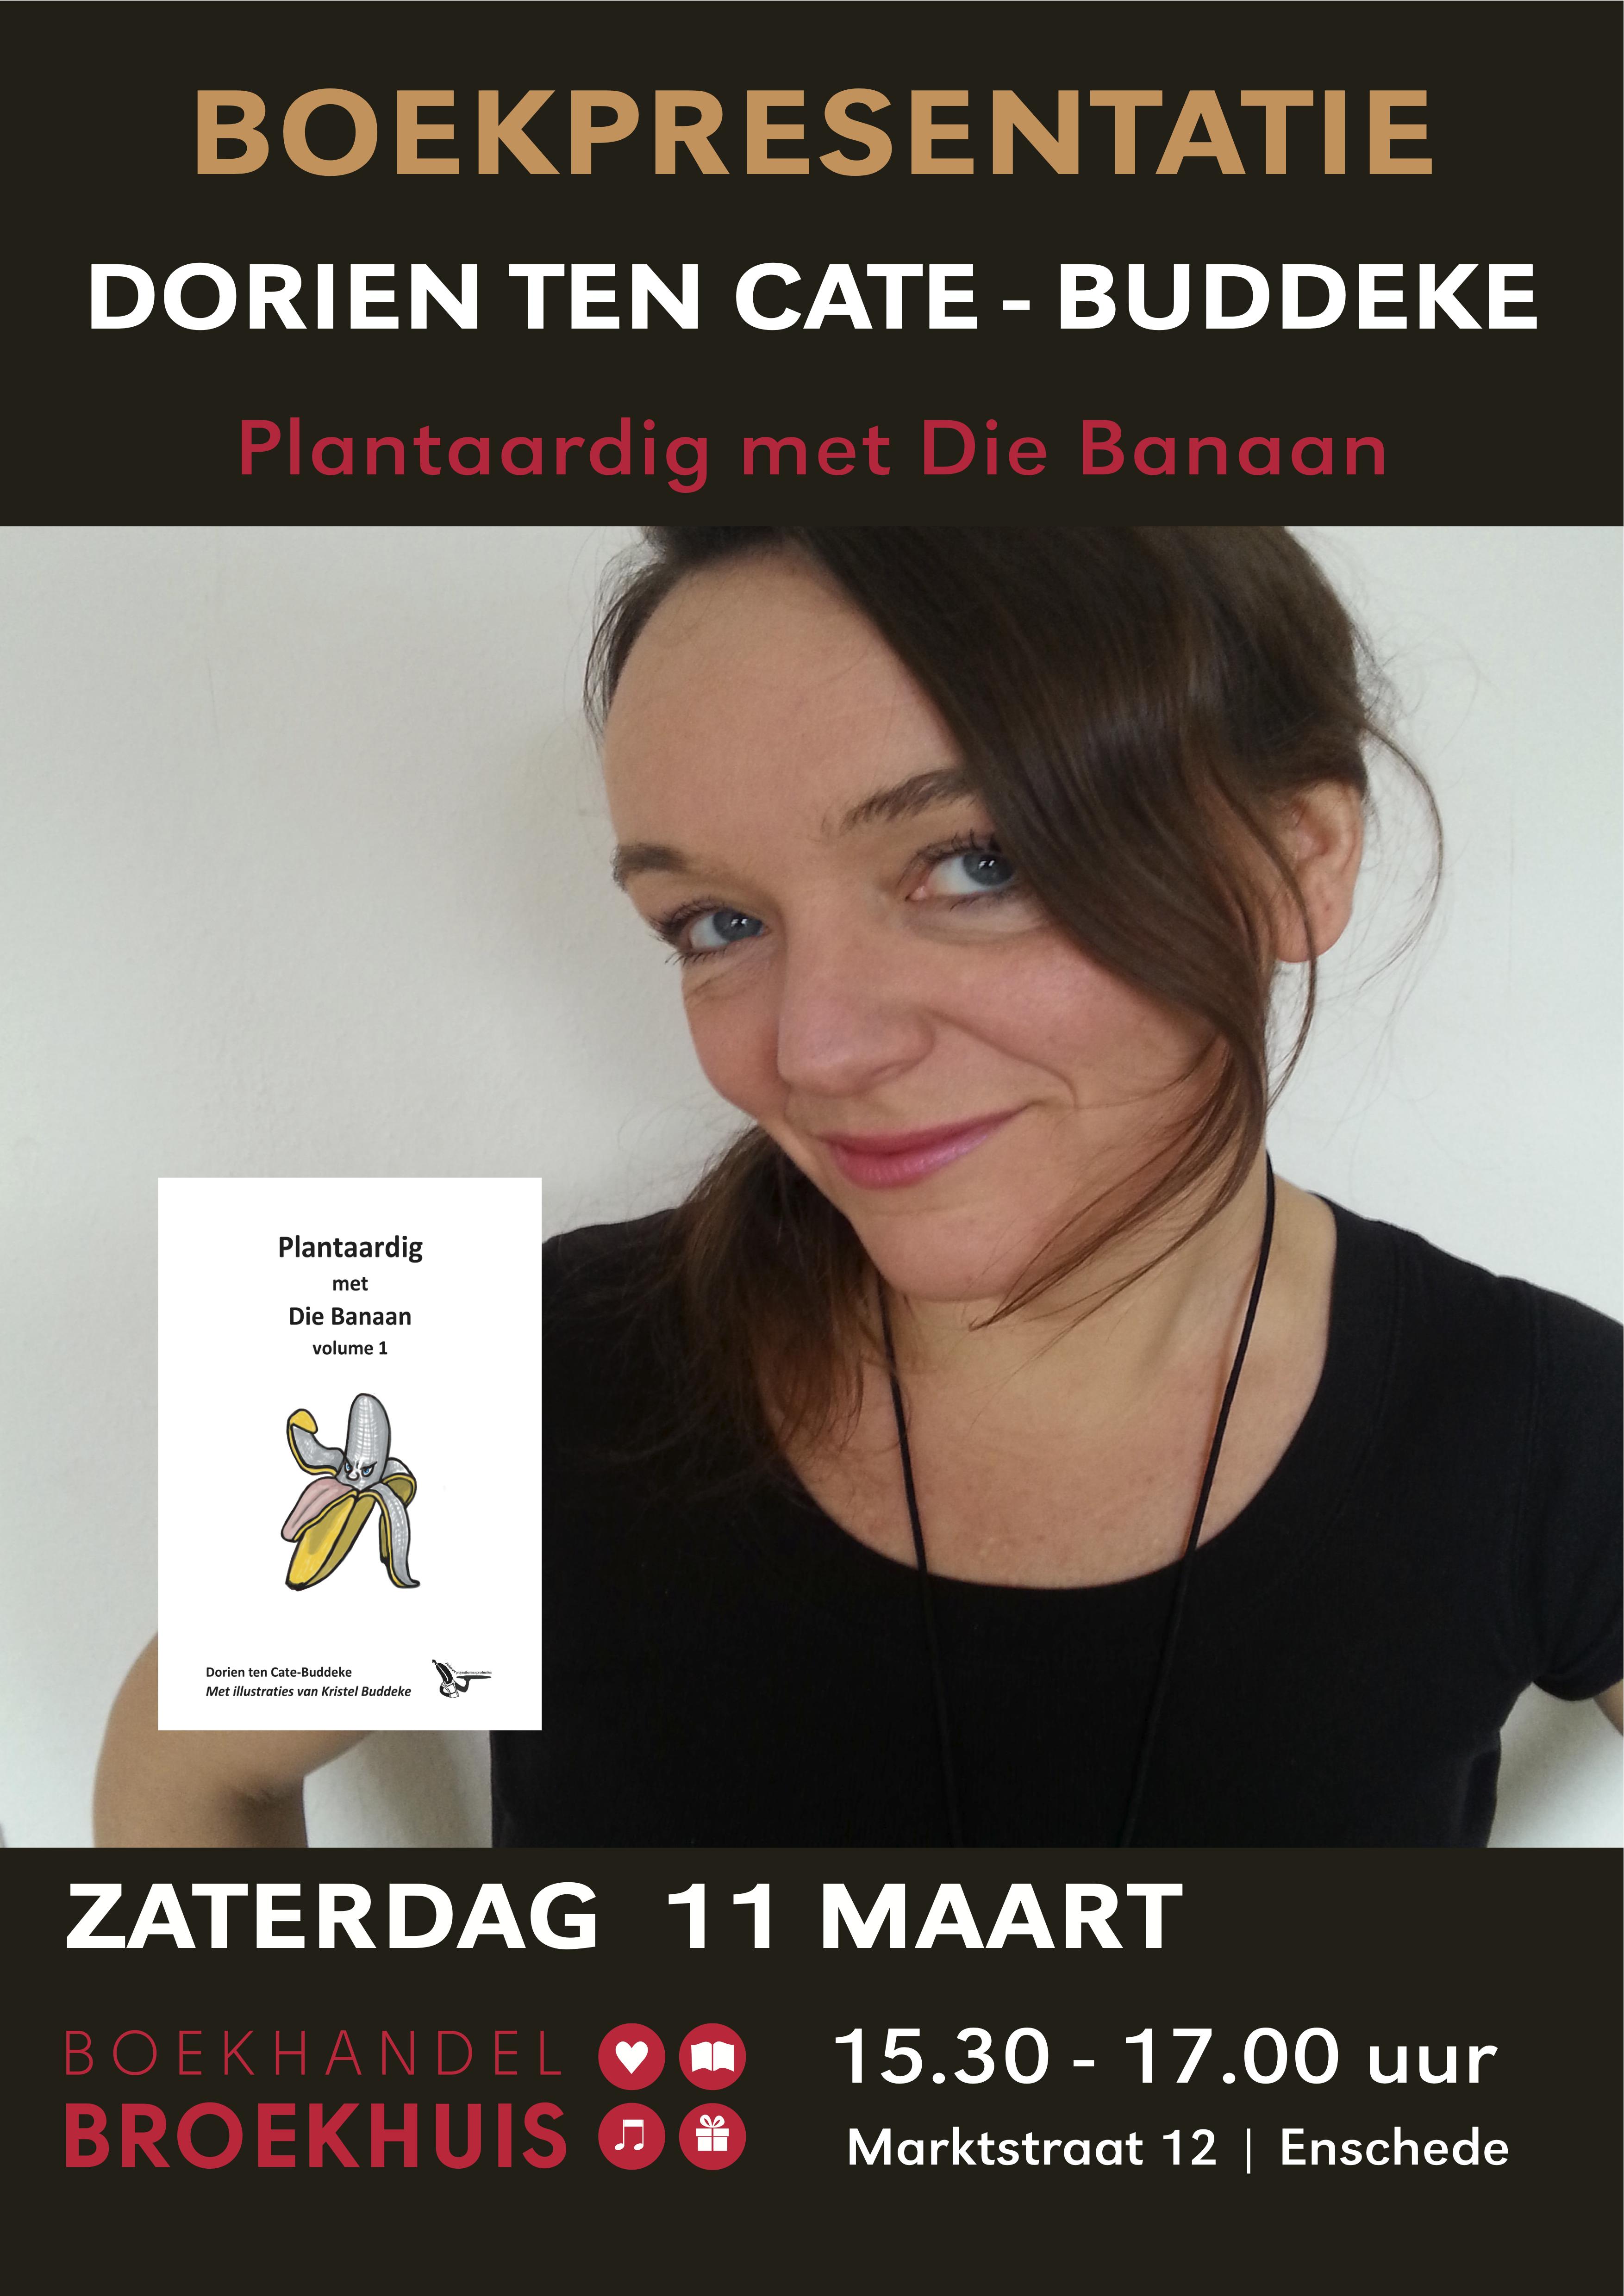 Boekpresentatie DORIEN TEN CATE-BUDDEKE Plantaardig met die banaan